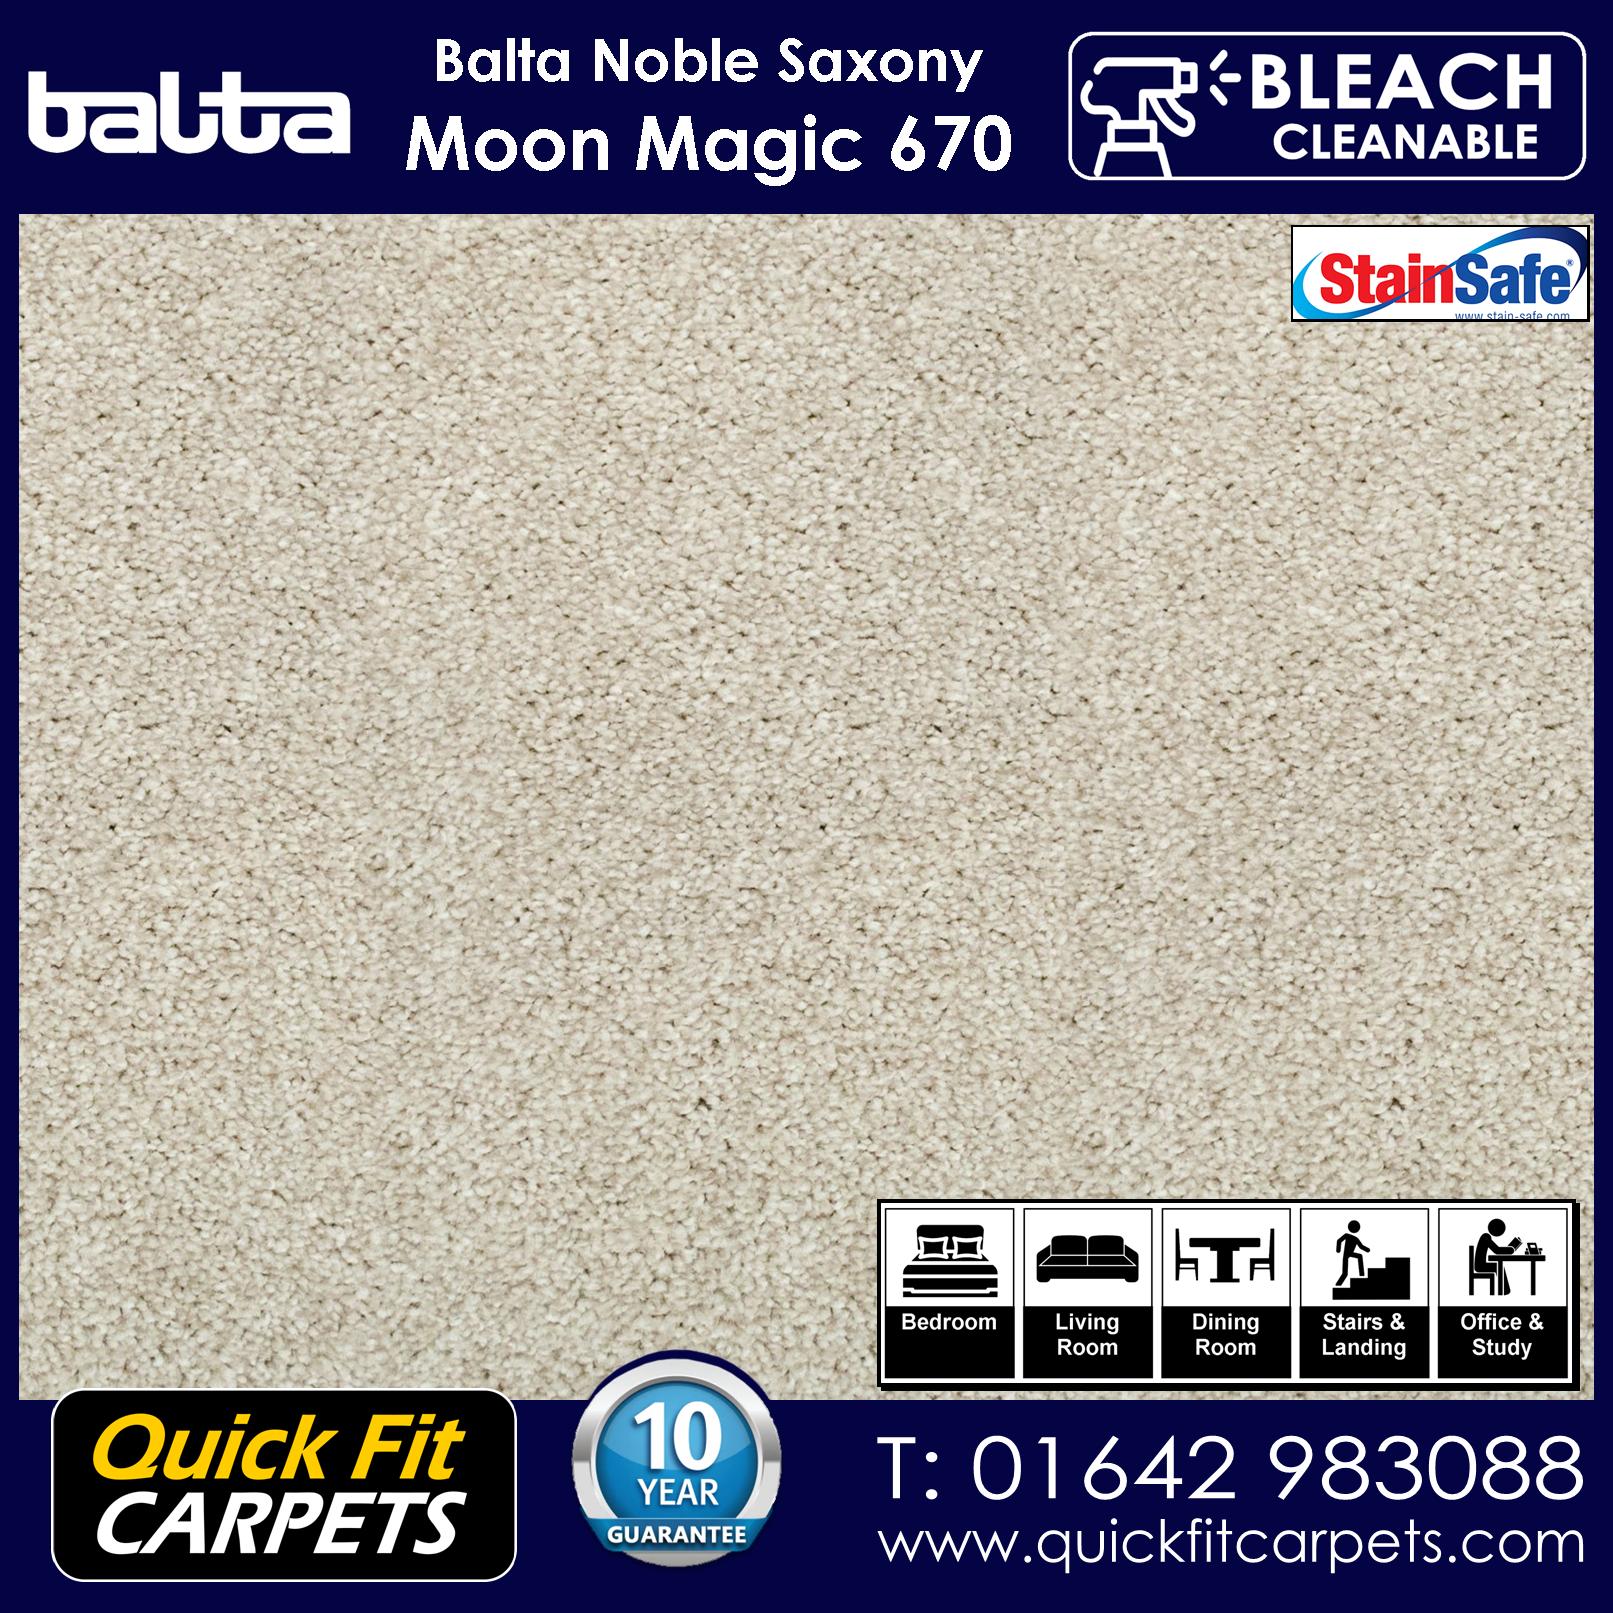 Quick Fit Carpets Balta Luxury Pile Moon Magic 670